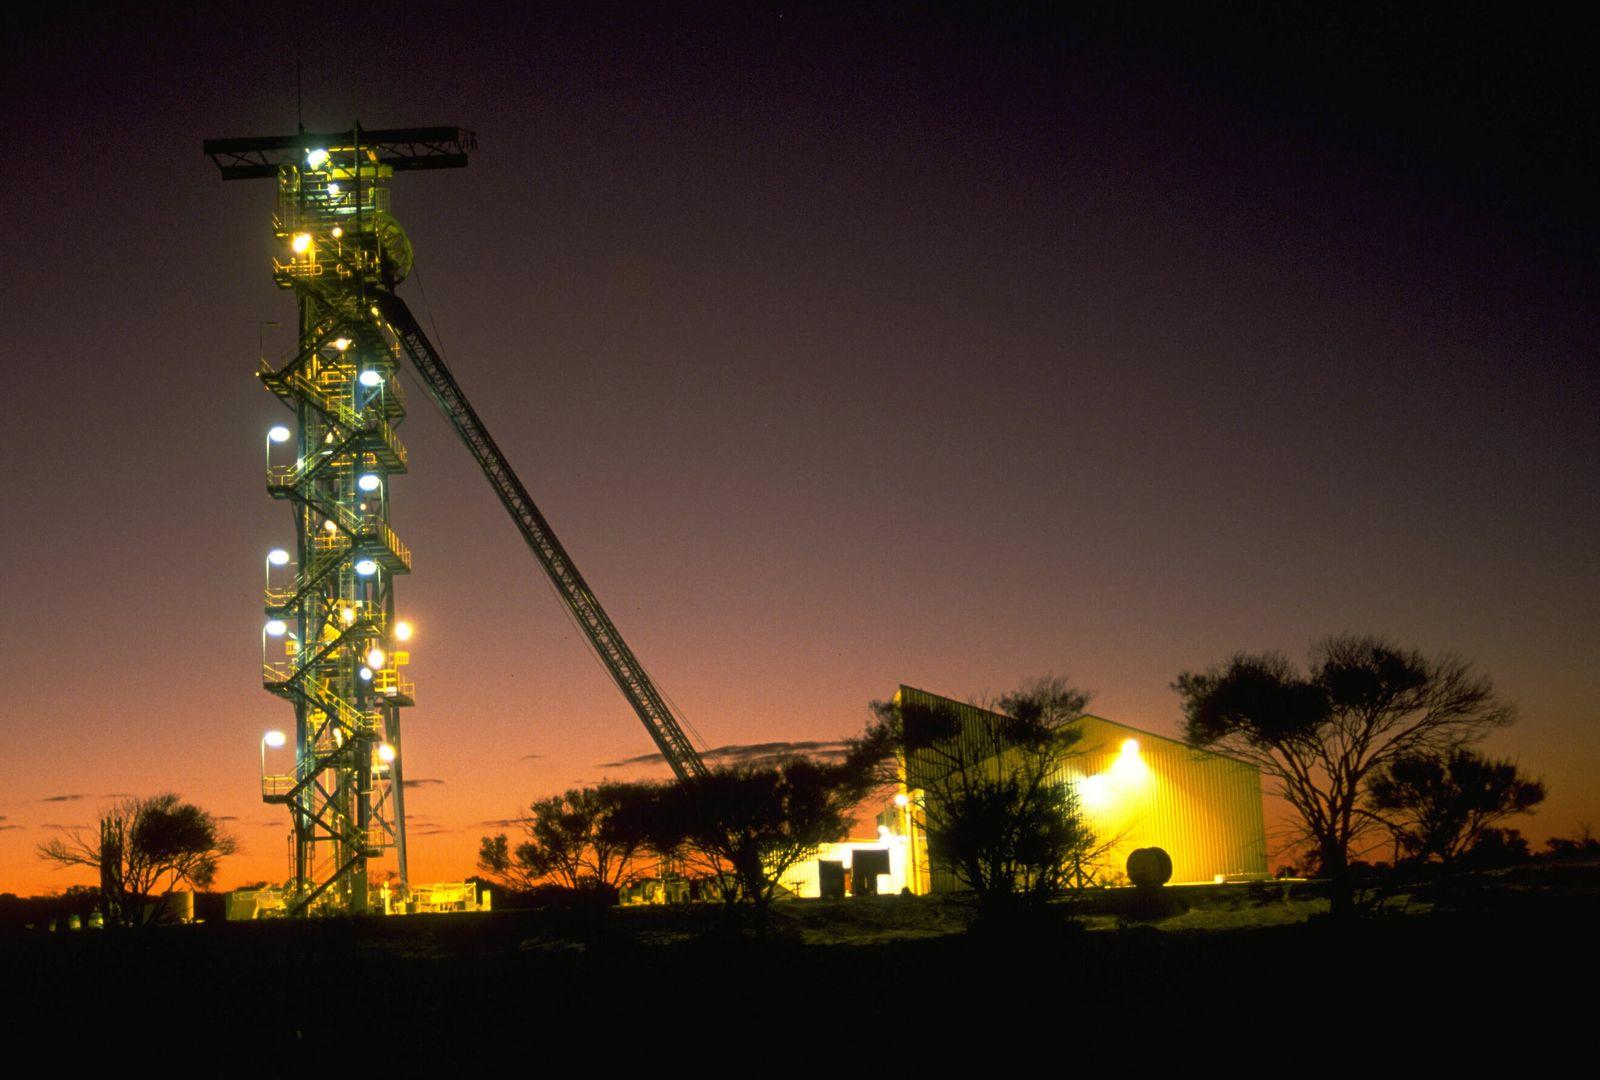 AUSTRALIA-MINING-BHP BILLITON